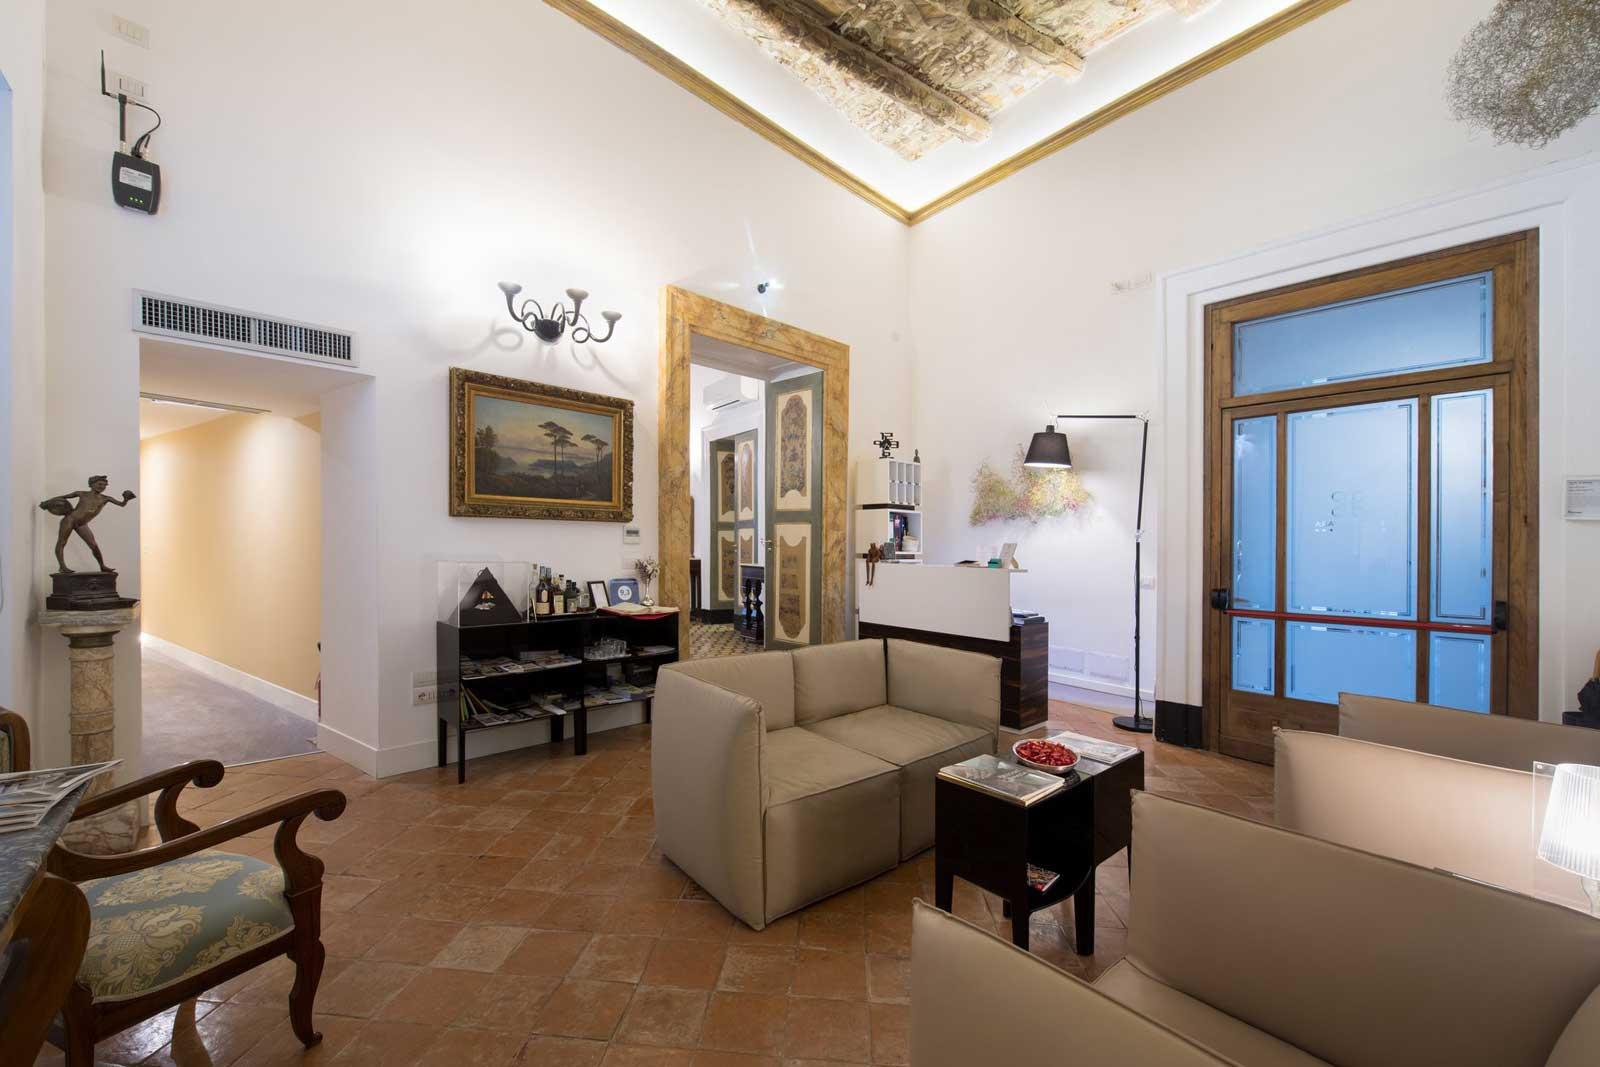 Santa Chiara Boutique Hotel 4 stelle Napoli